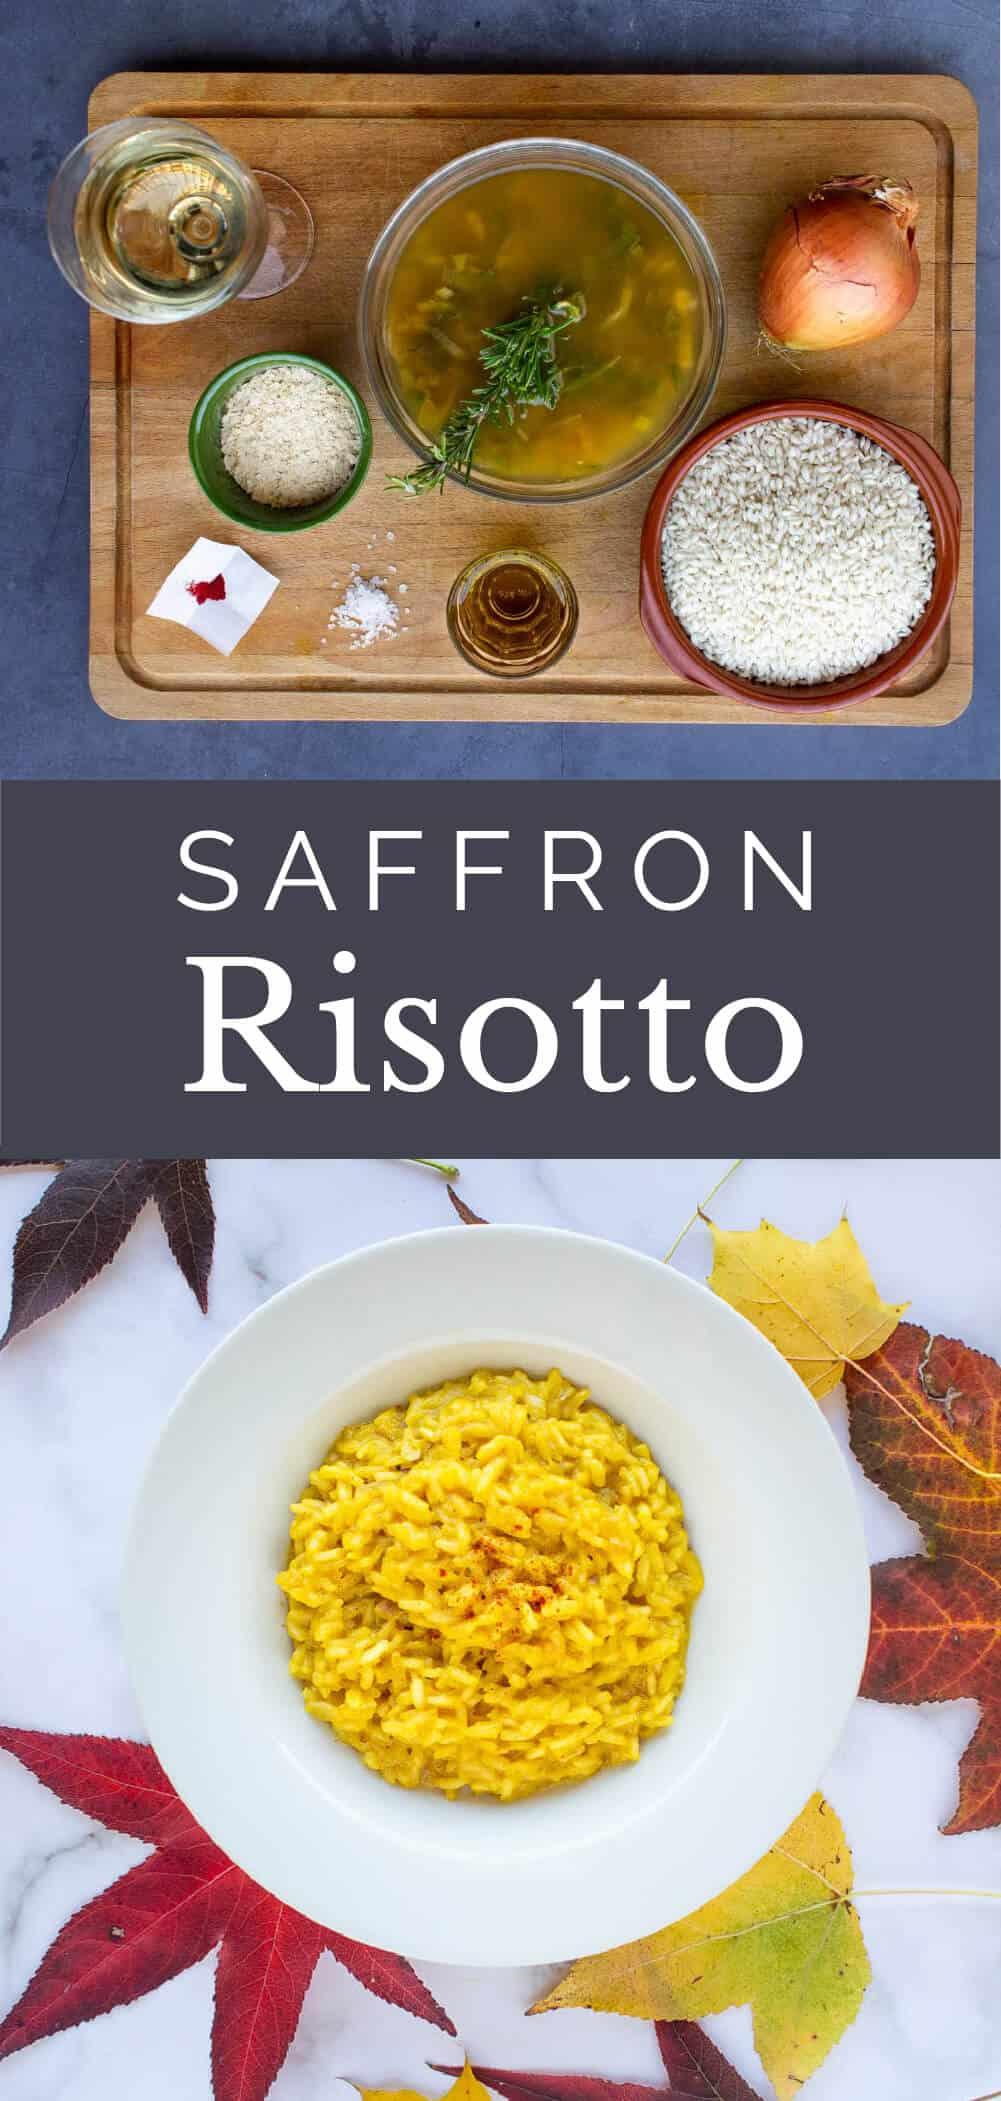 saffron risotto with leaves